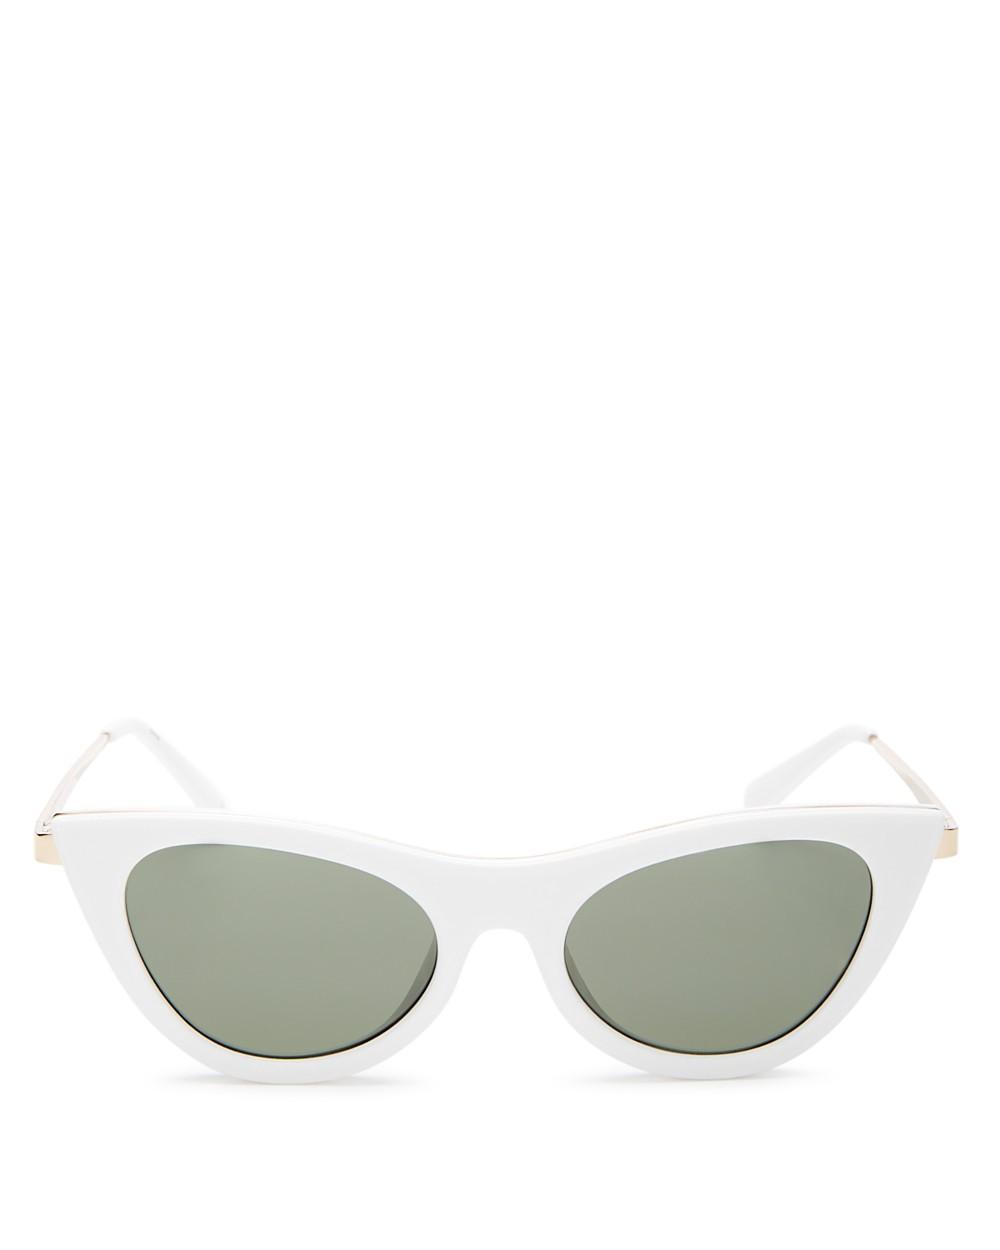 5e3b1d272229 LE SPECS. Women s Enchantress Cat Eye Sunglasses ...